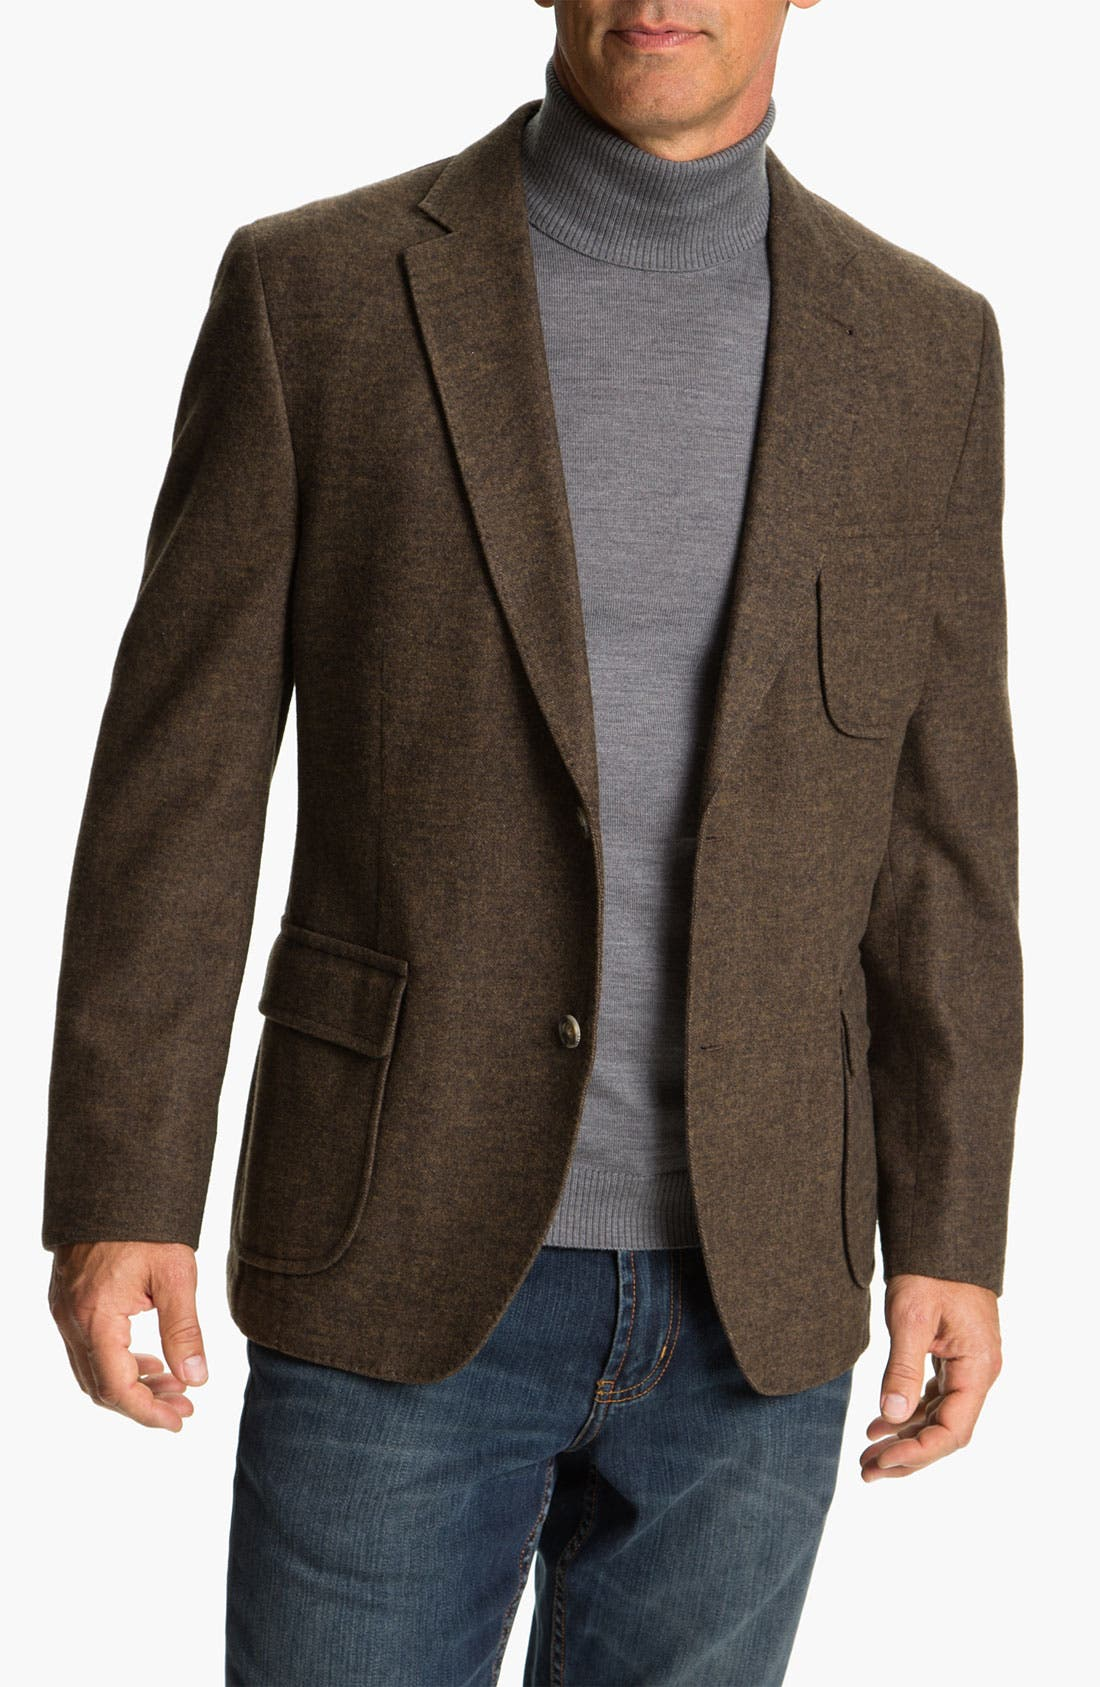 Alternate Image 1 Selected - Kroon 'Harrison' Wool & Cotton Blend  Sportcoat